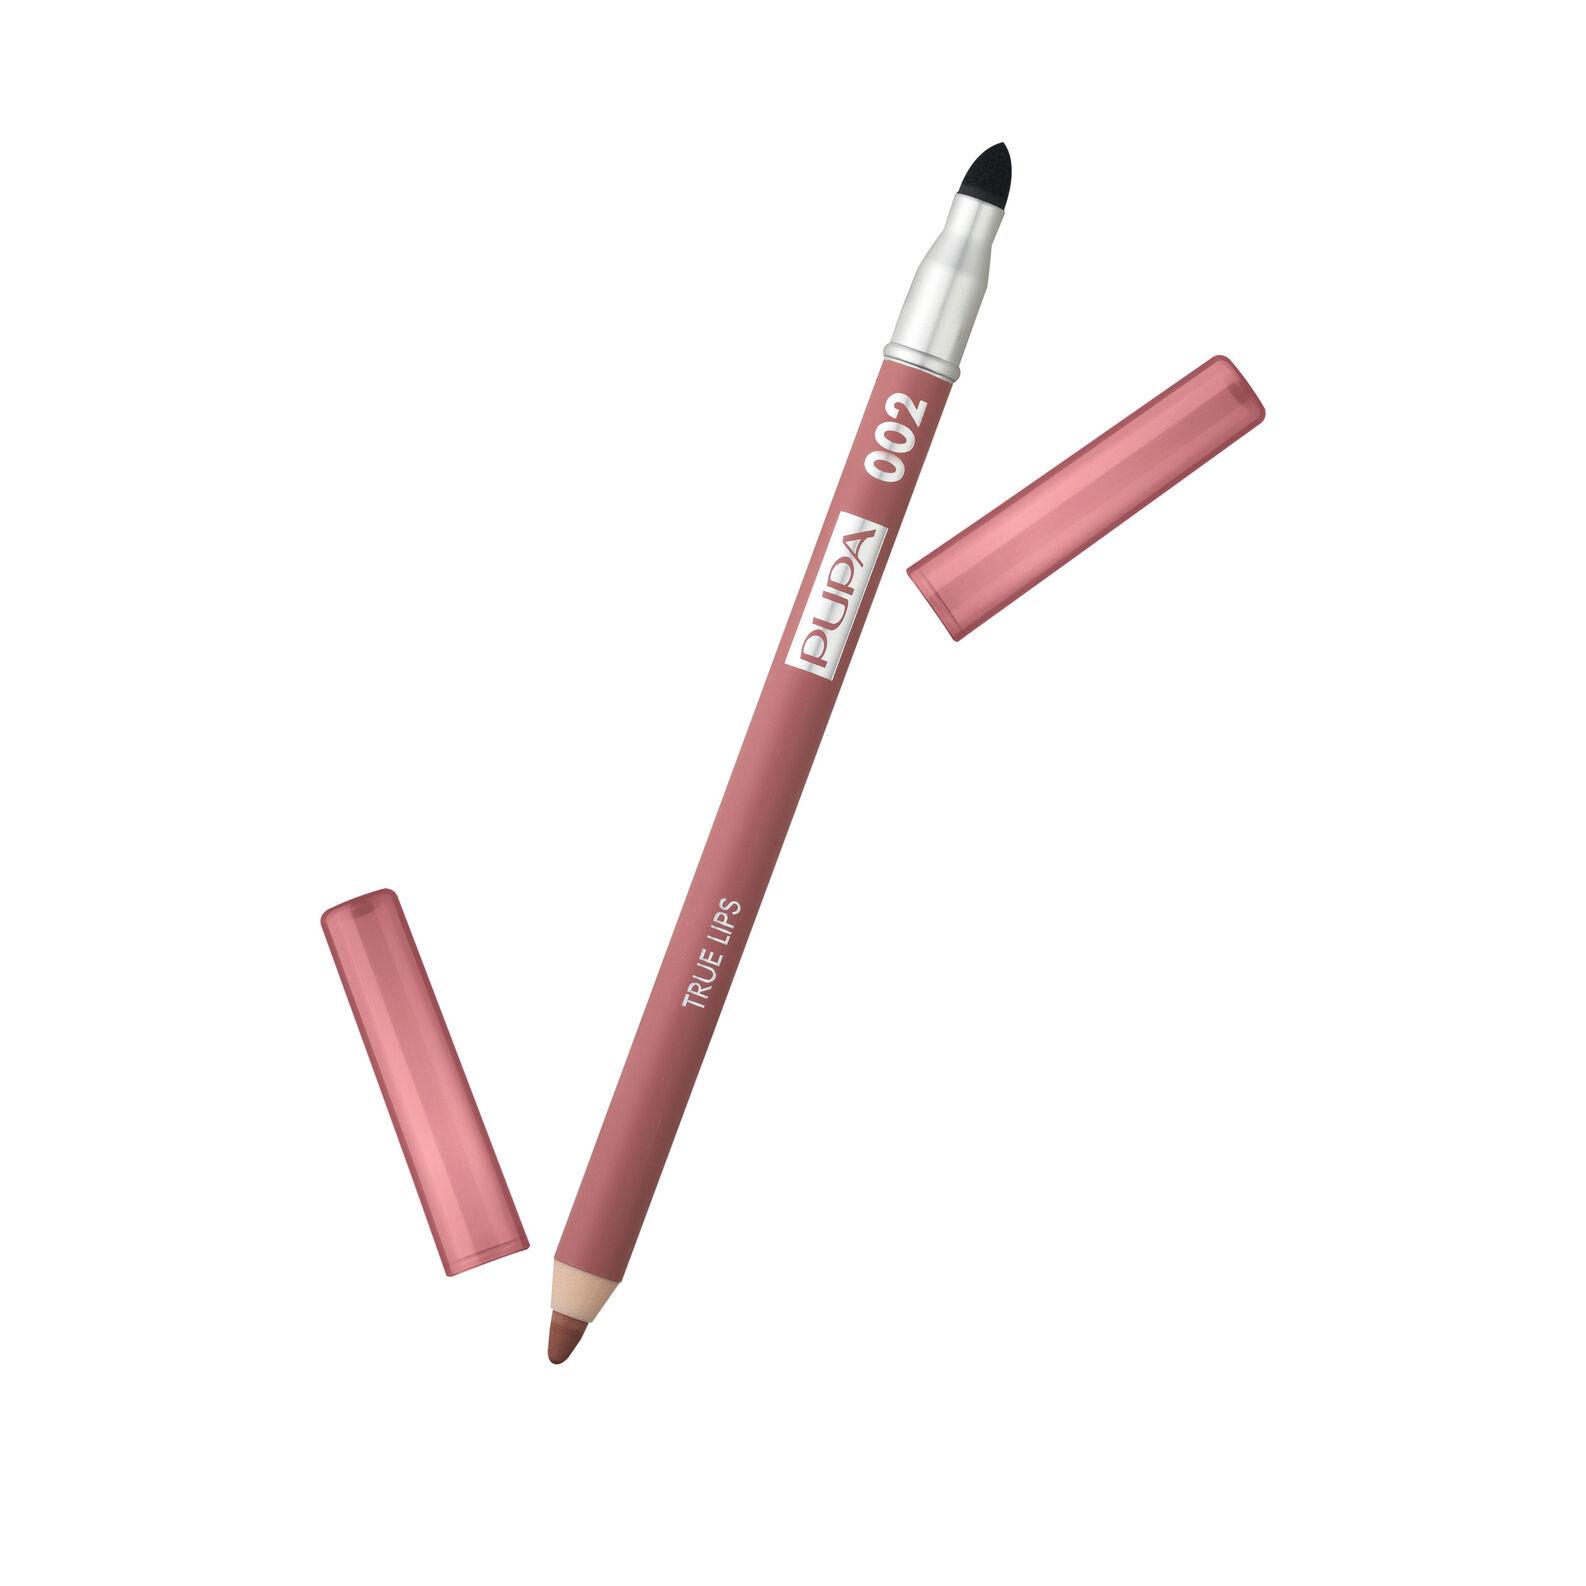 Pupa true lips contour pencil - 02